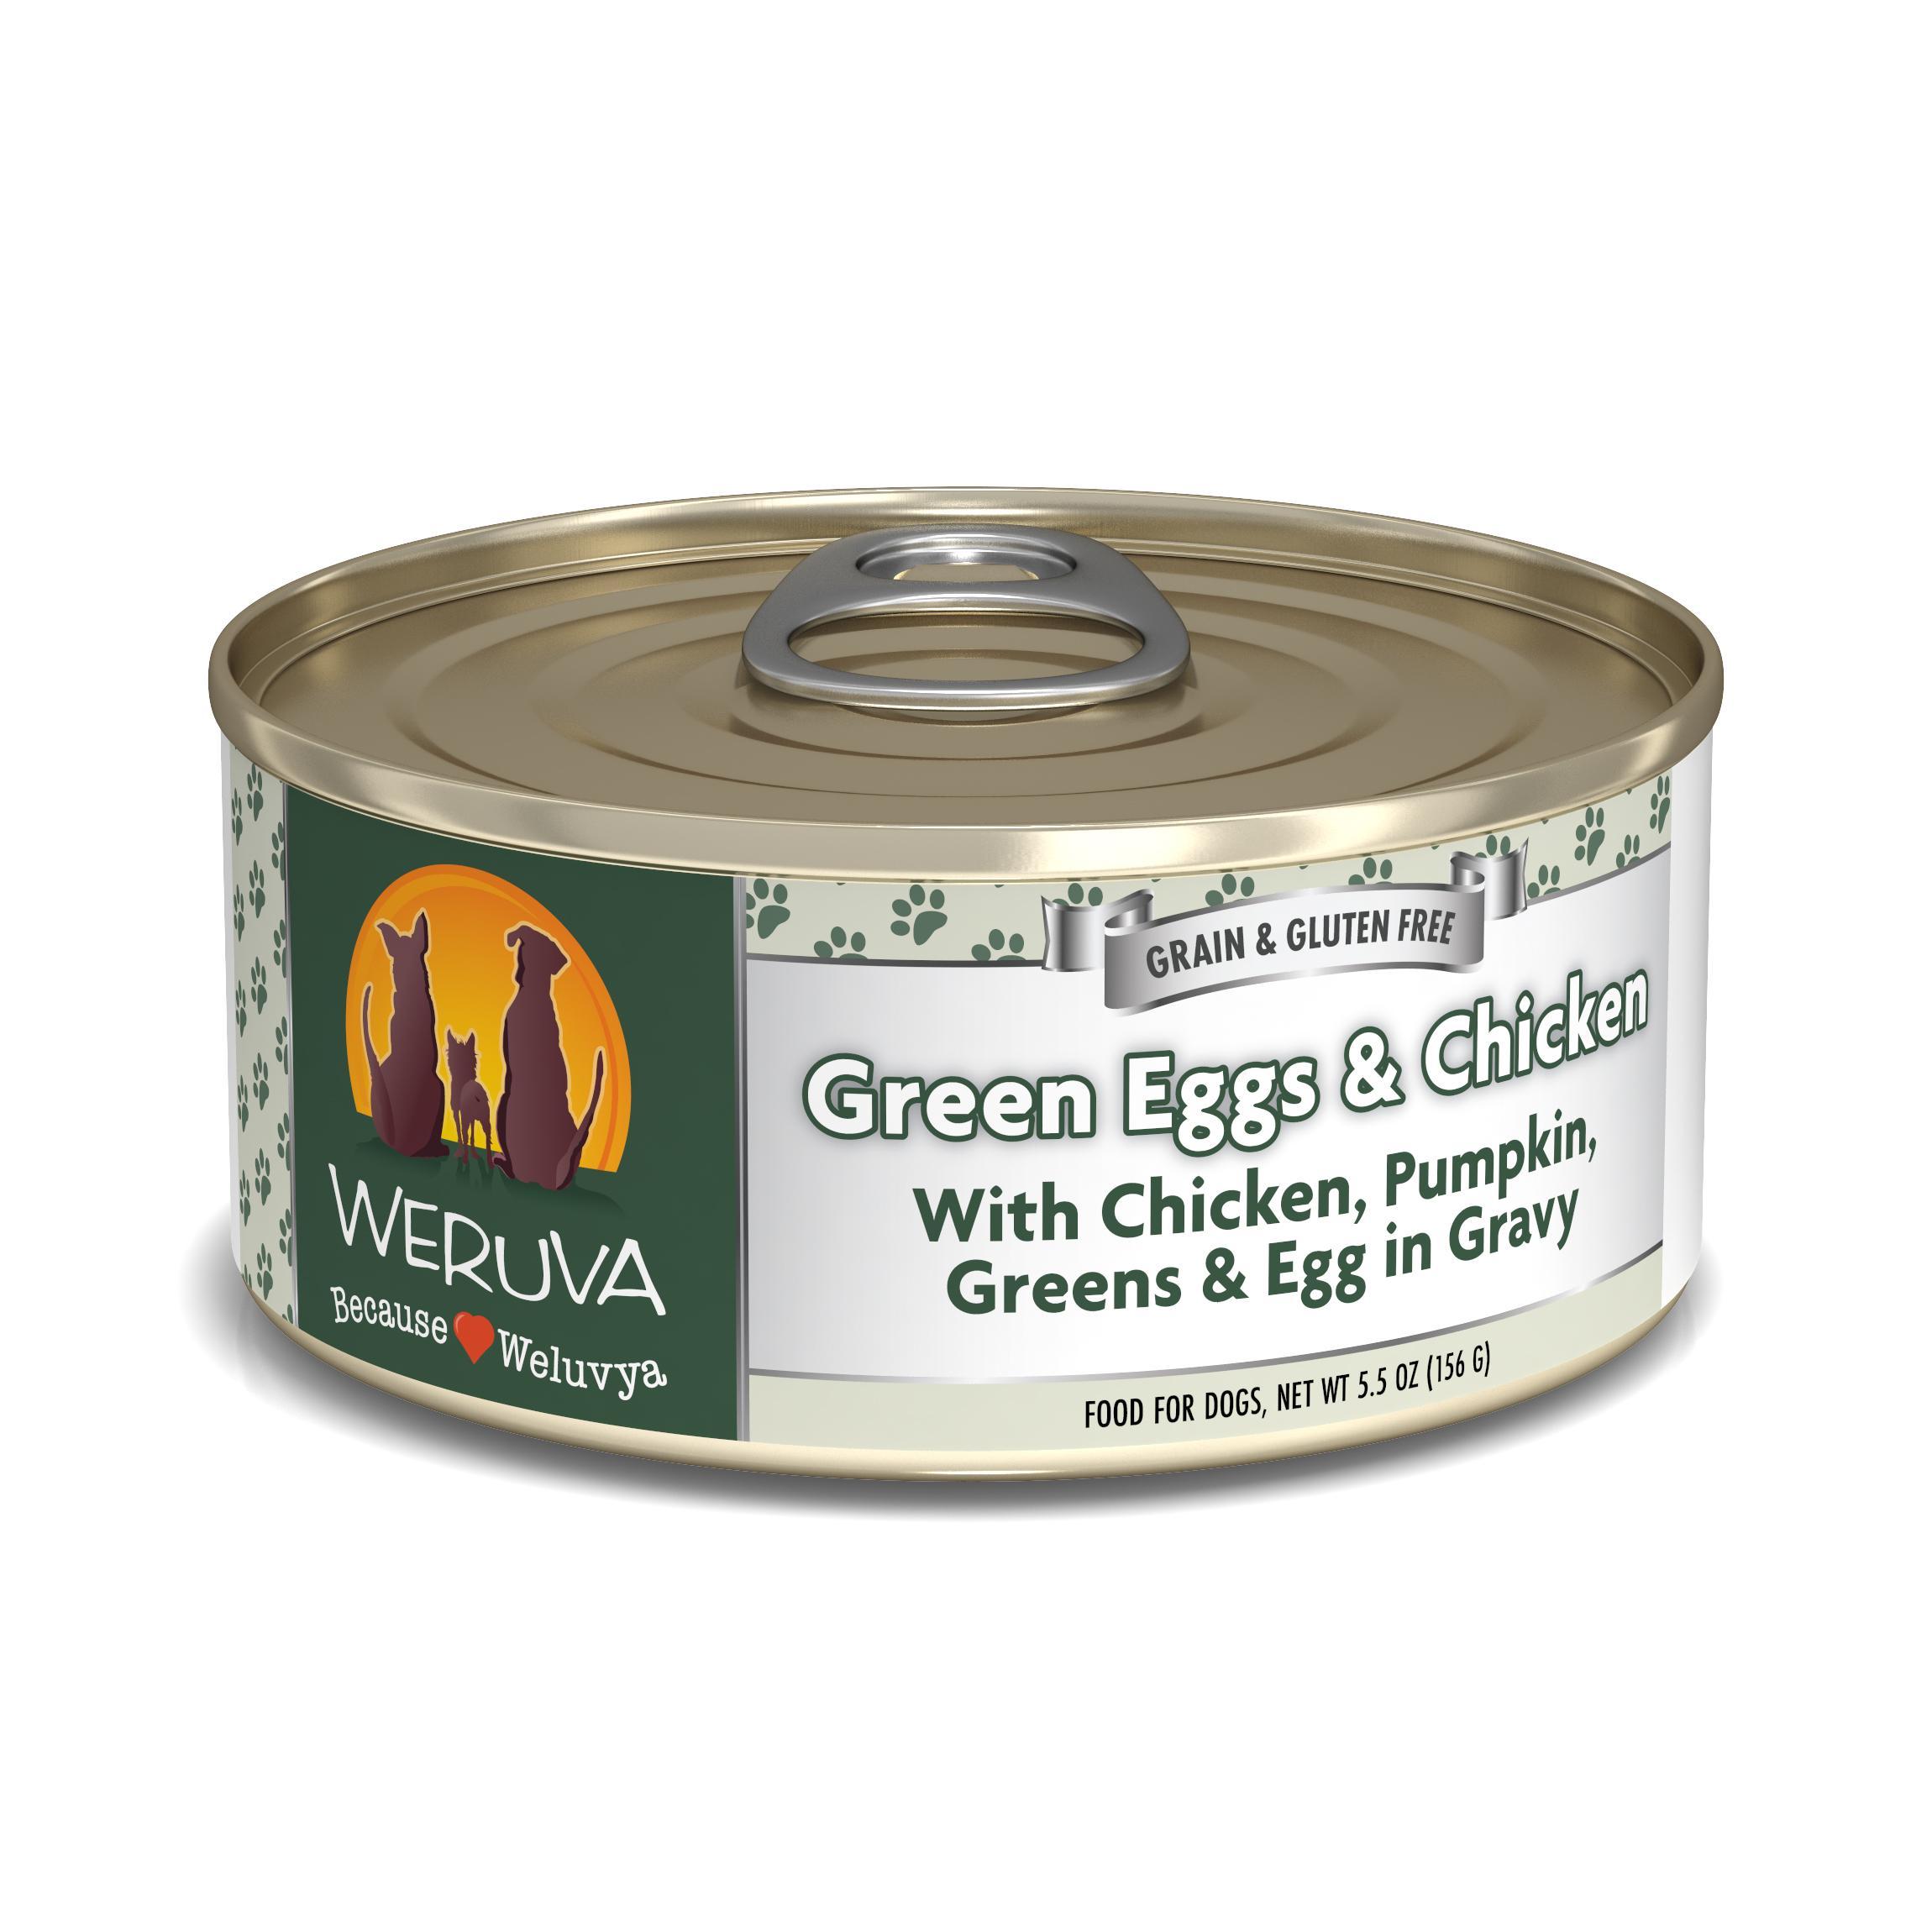 Weruva Dog Classic Green Eggs & Chicken with Chicken, Egg, & Greens in Gravy Grain-Free Wet Dog Food Image